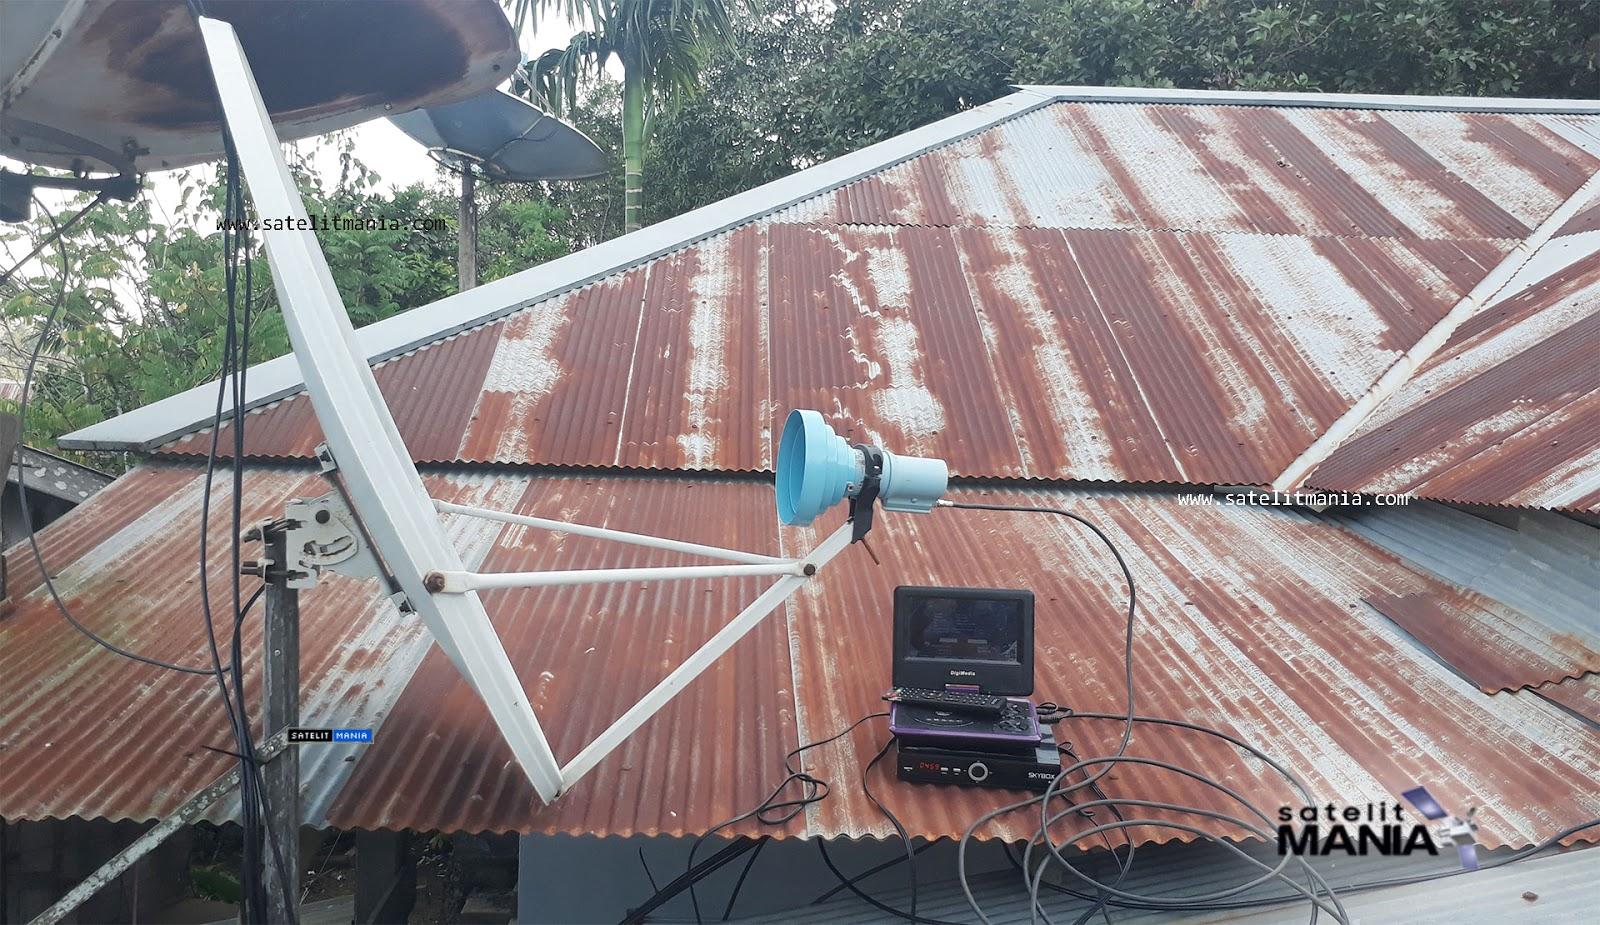 thaicom 5 dengan dish indovision